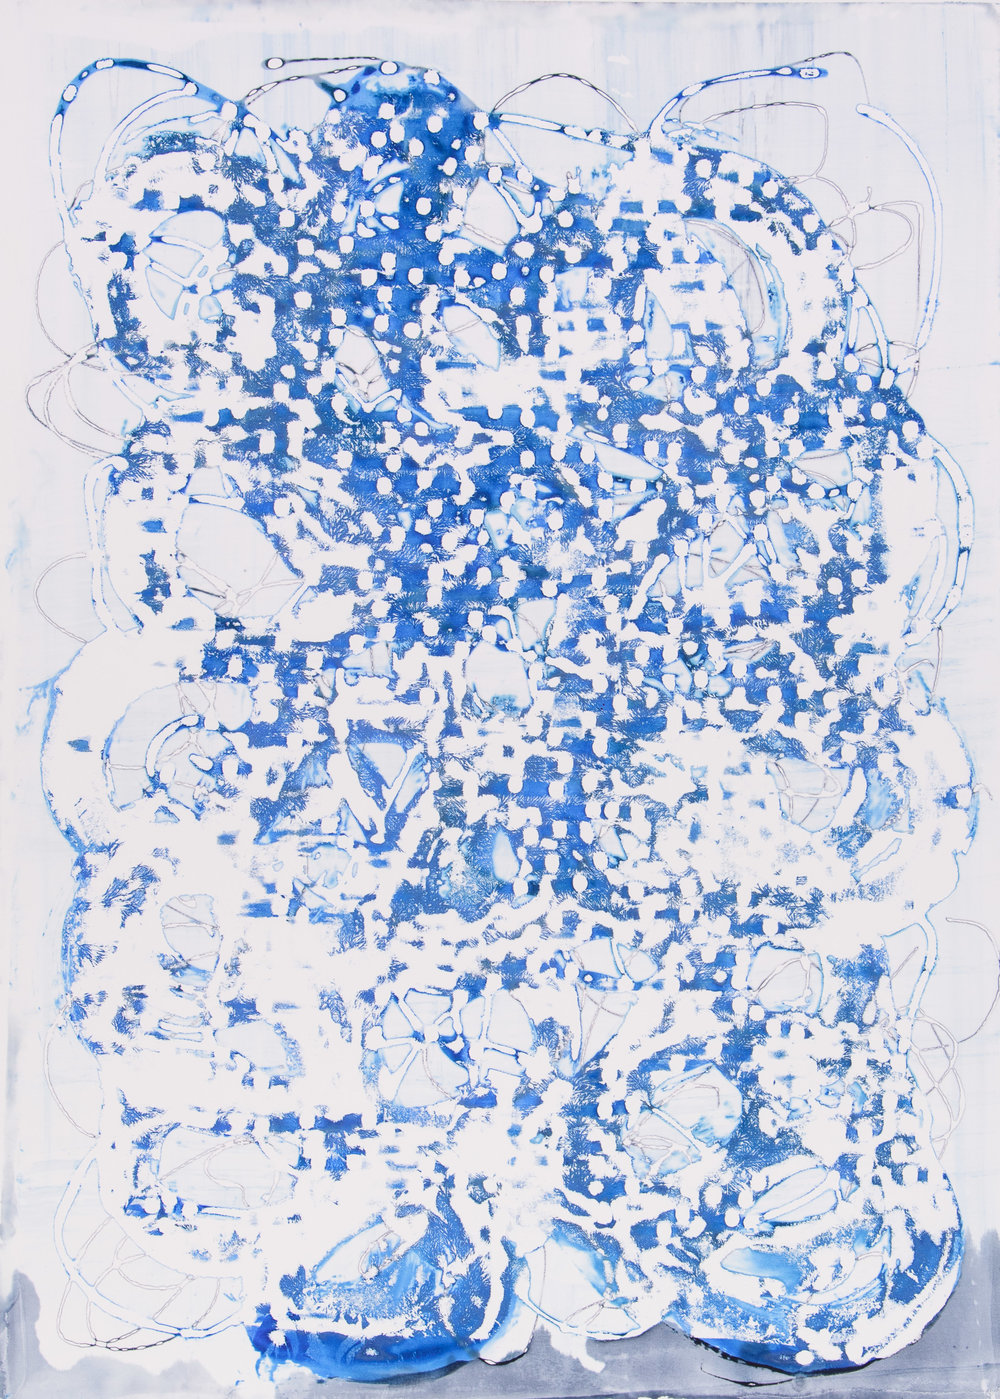 Blue Yonder I, 33X43. Silkscreen painting on paper, 2017.